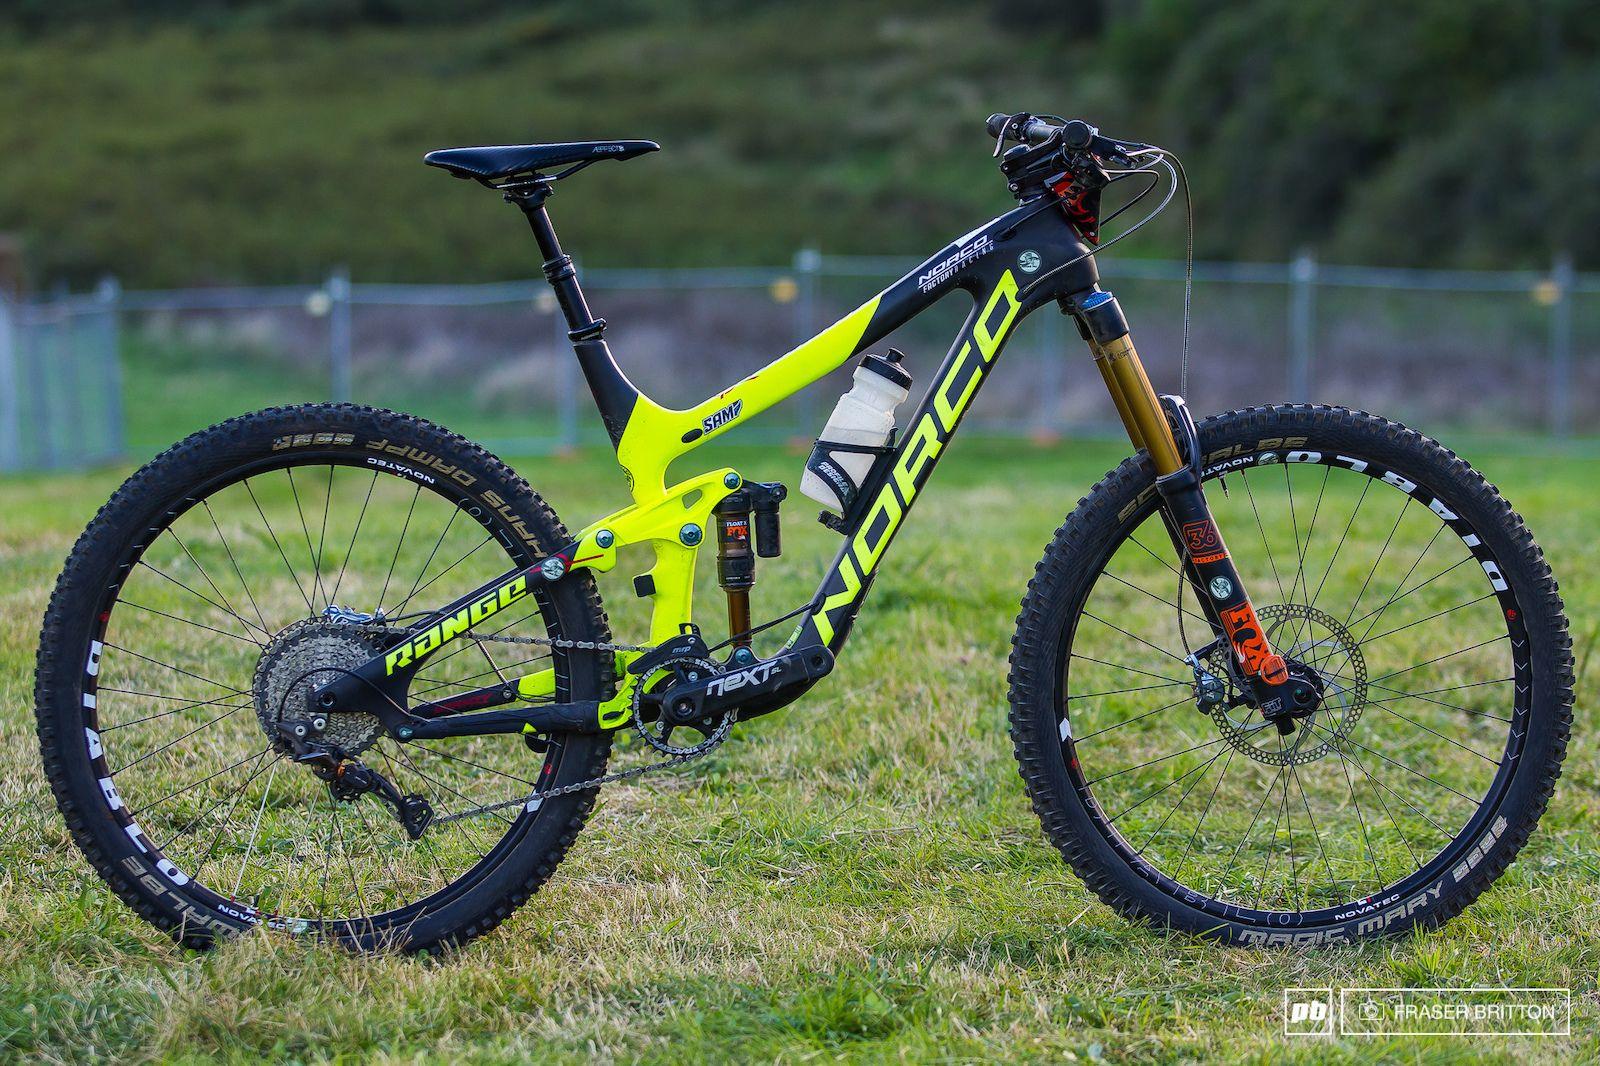 Sam Blenkinsop's Enduro Bike Check Crankworx Rotorua